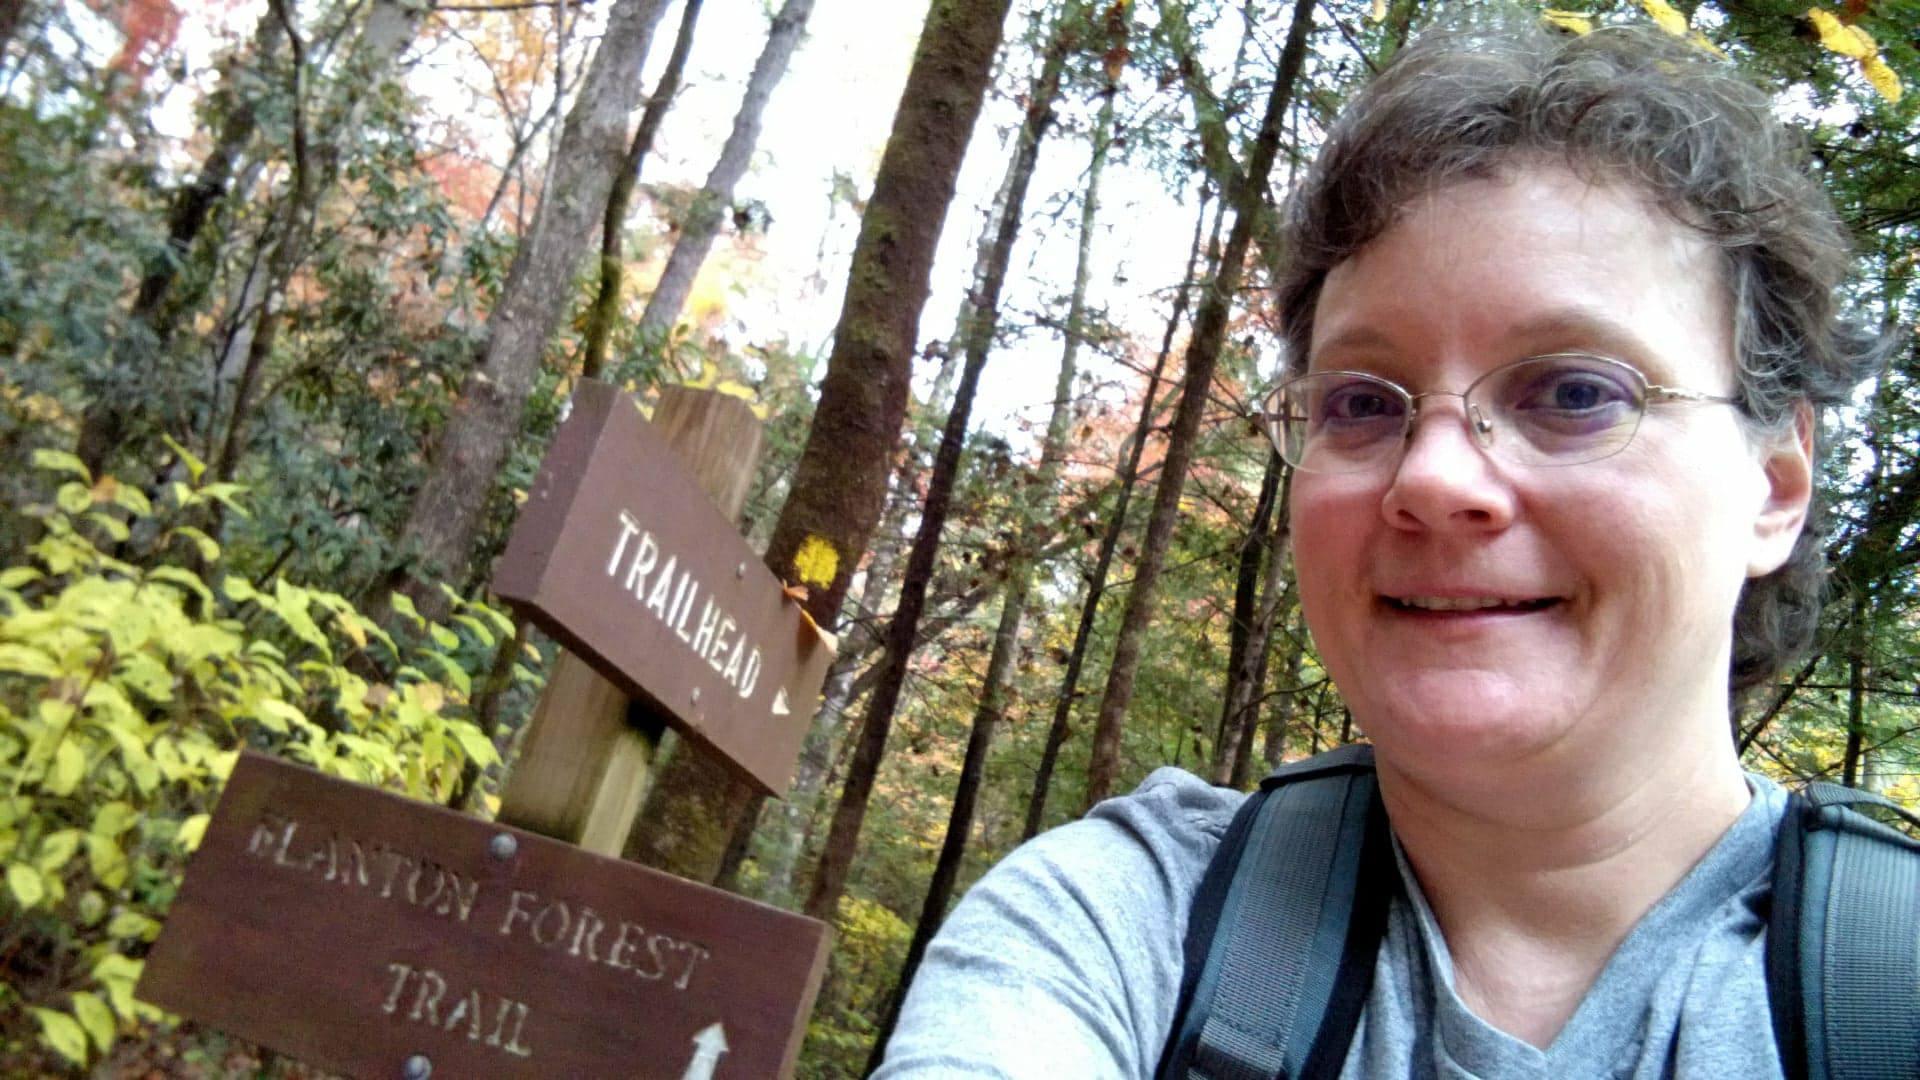 Leah Schade, Blanton Forest, Ky.